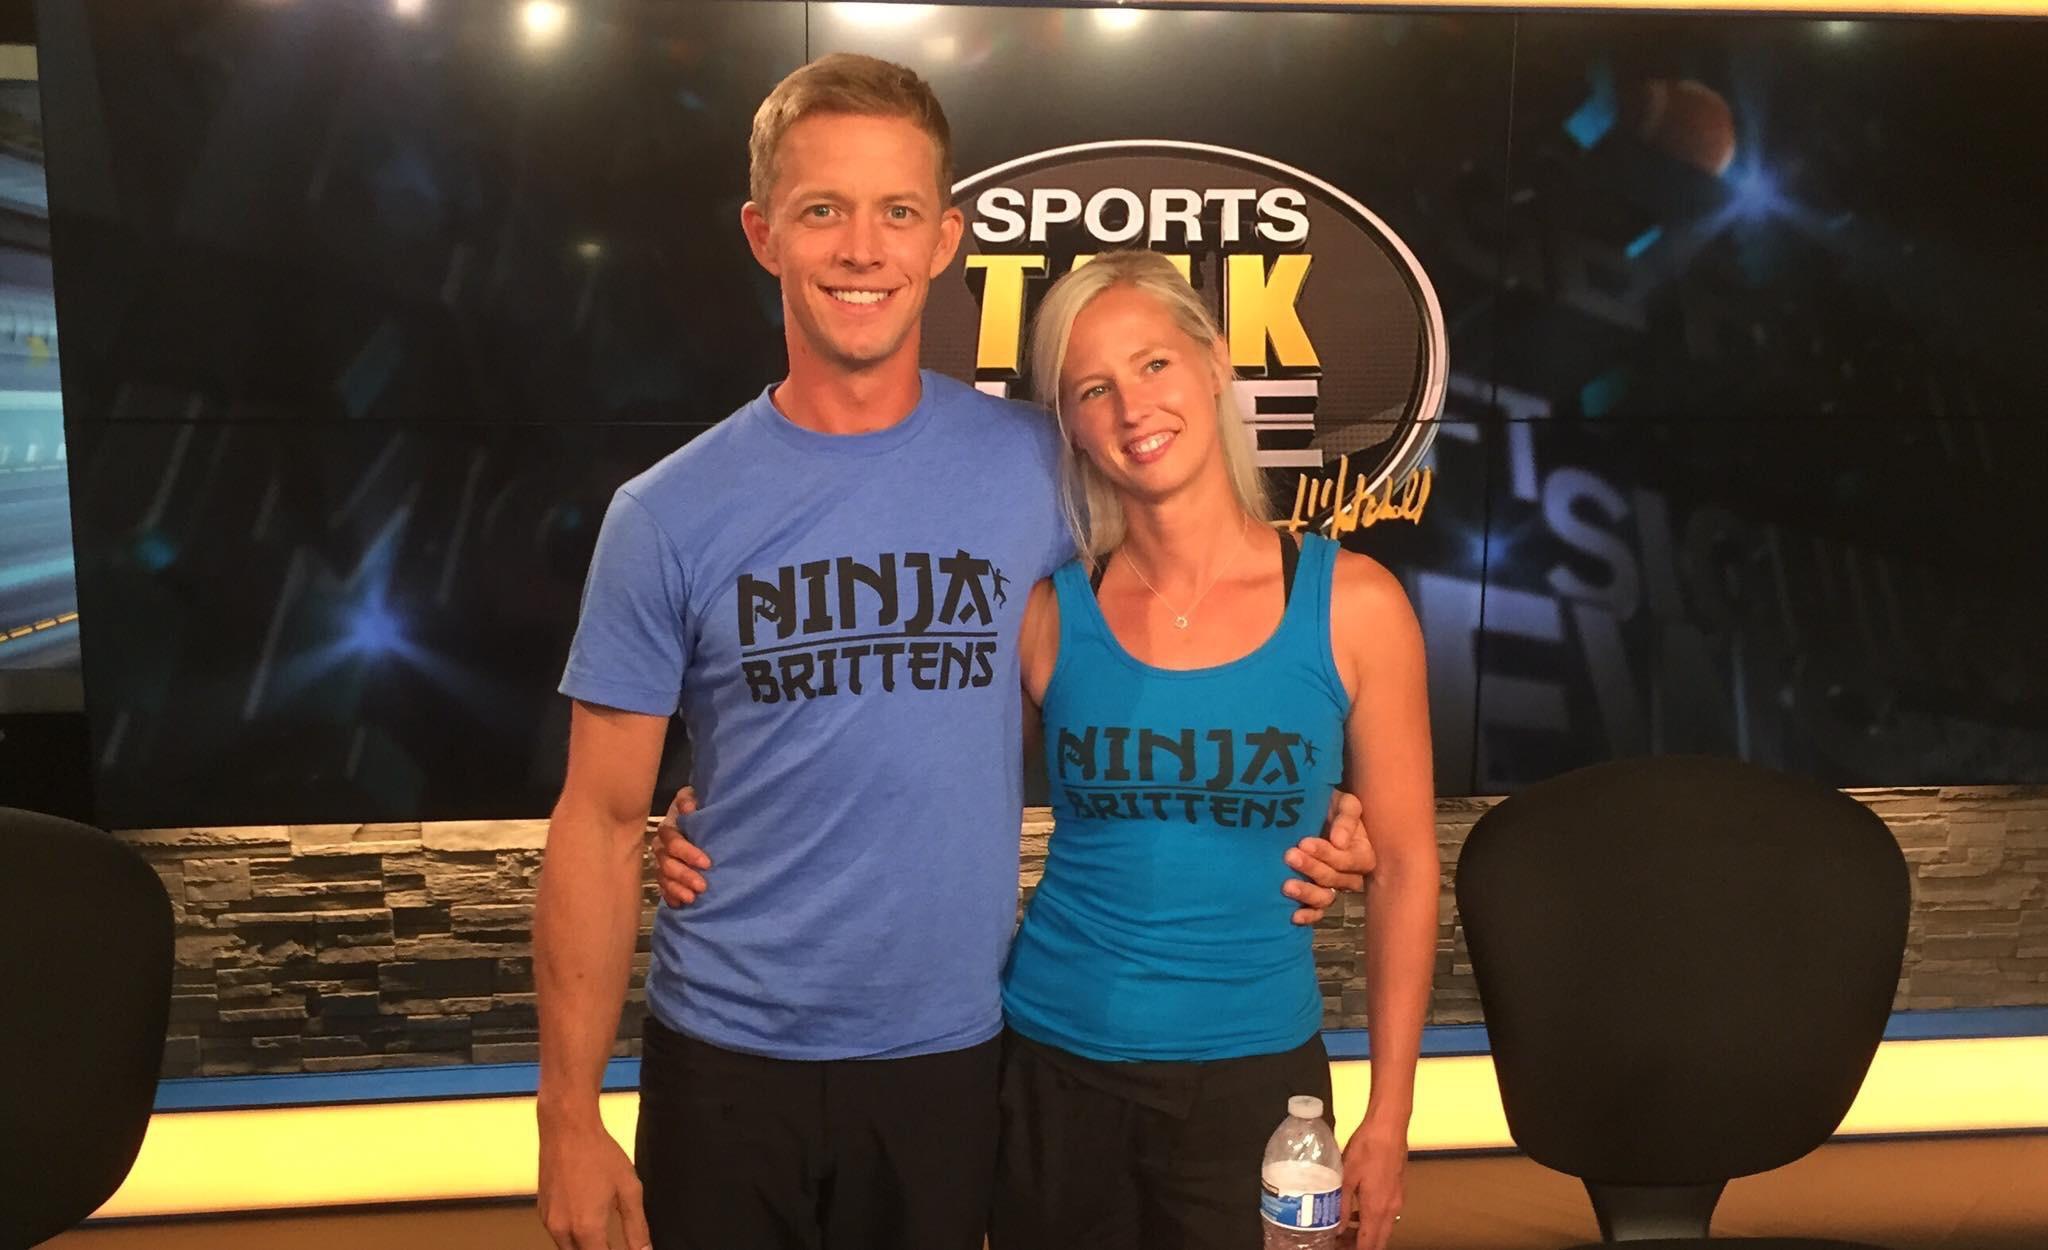 Geoff and Jessica Britten were among the stars on 'American Ninja Warrior' last season.